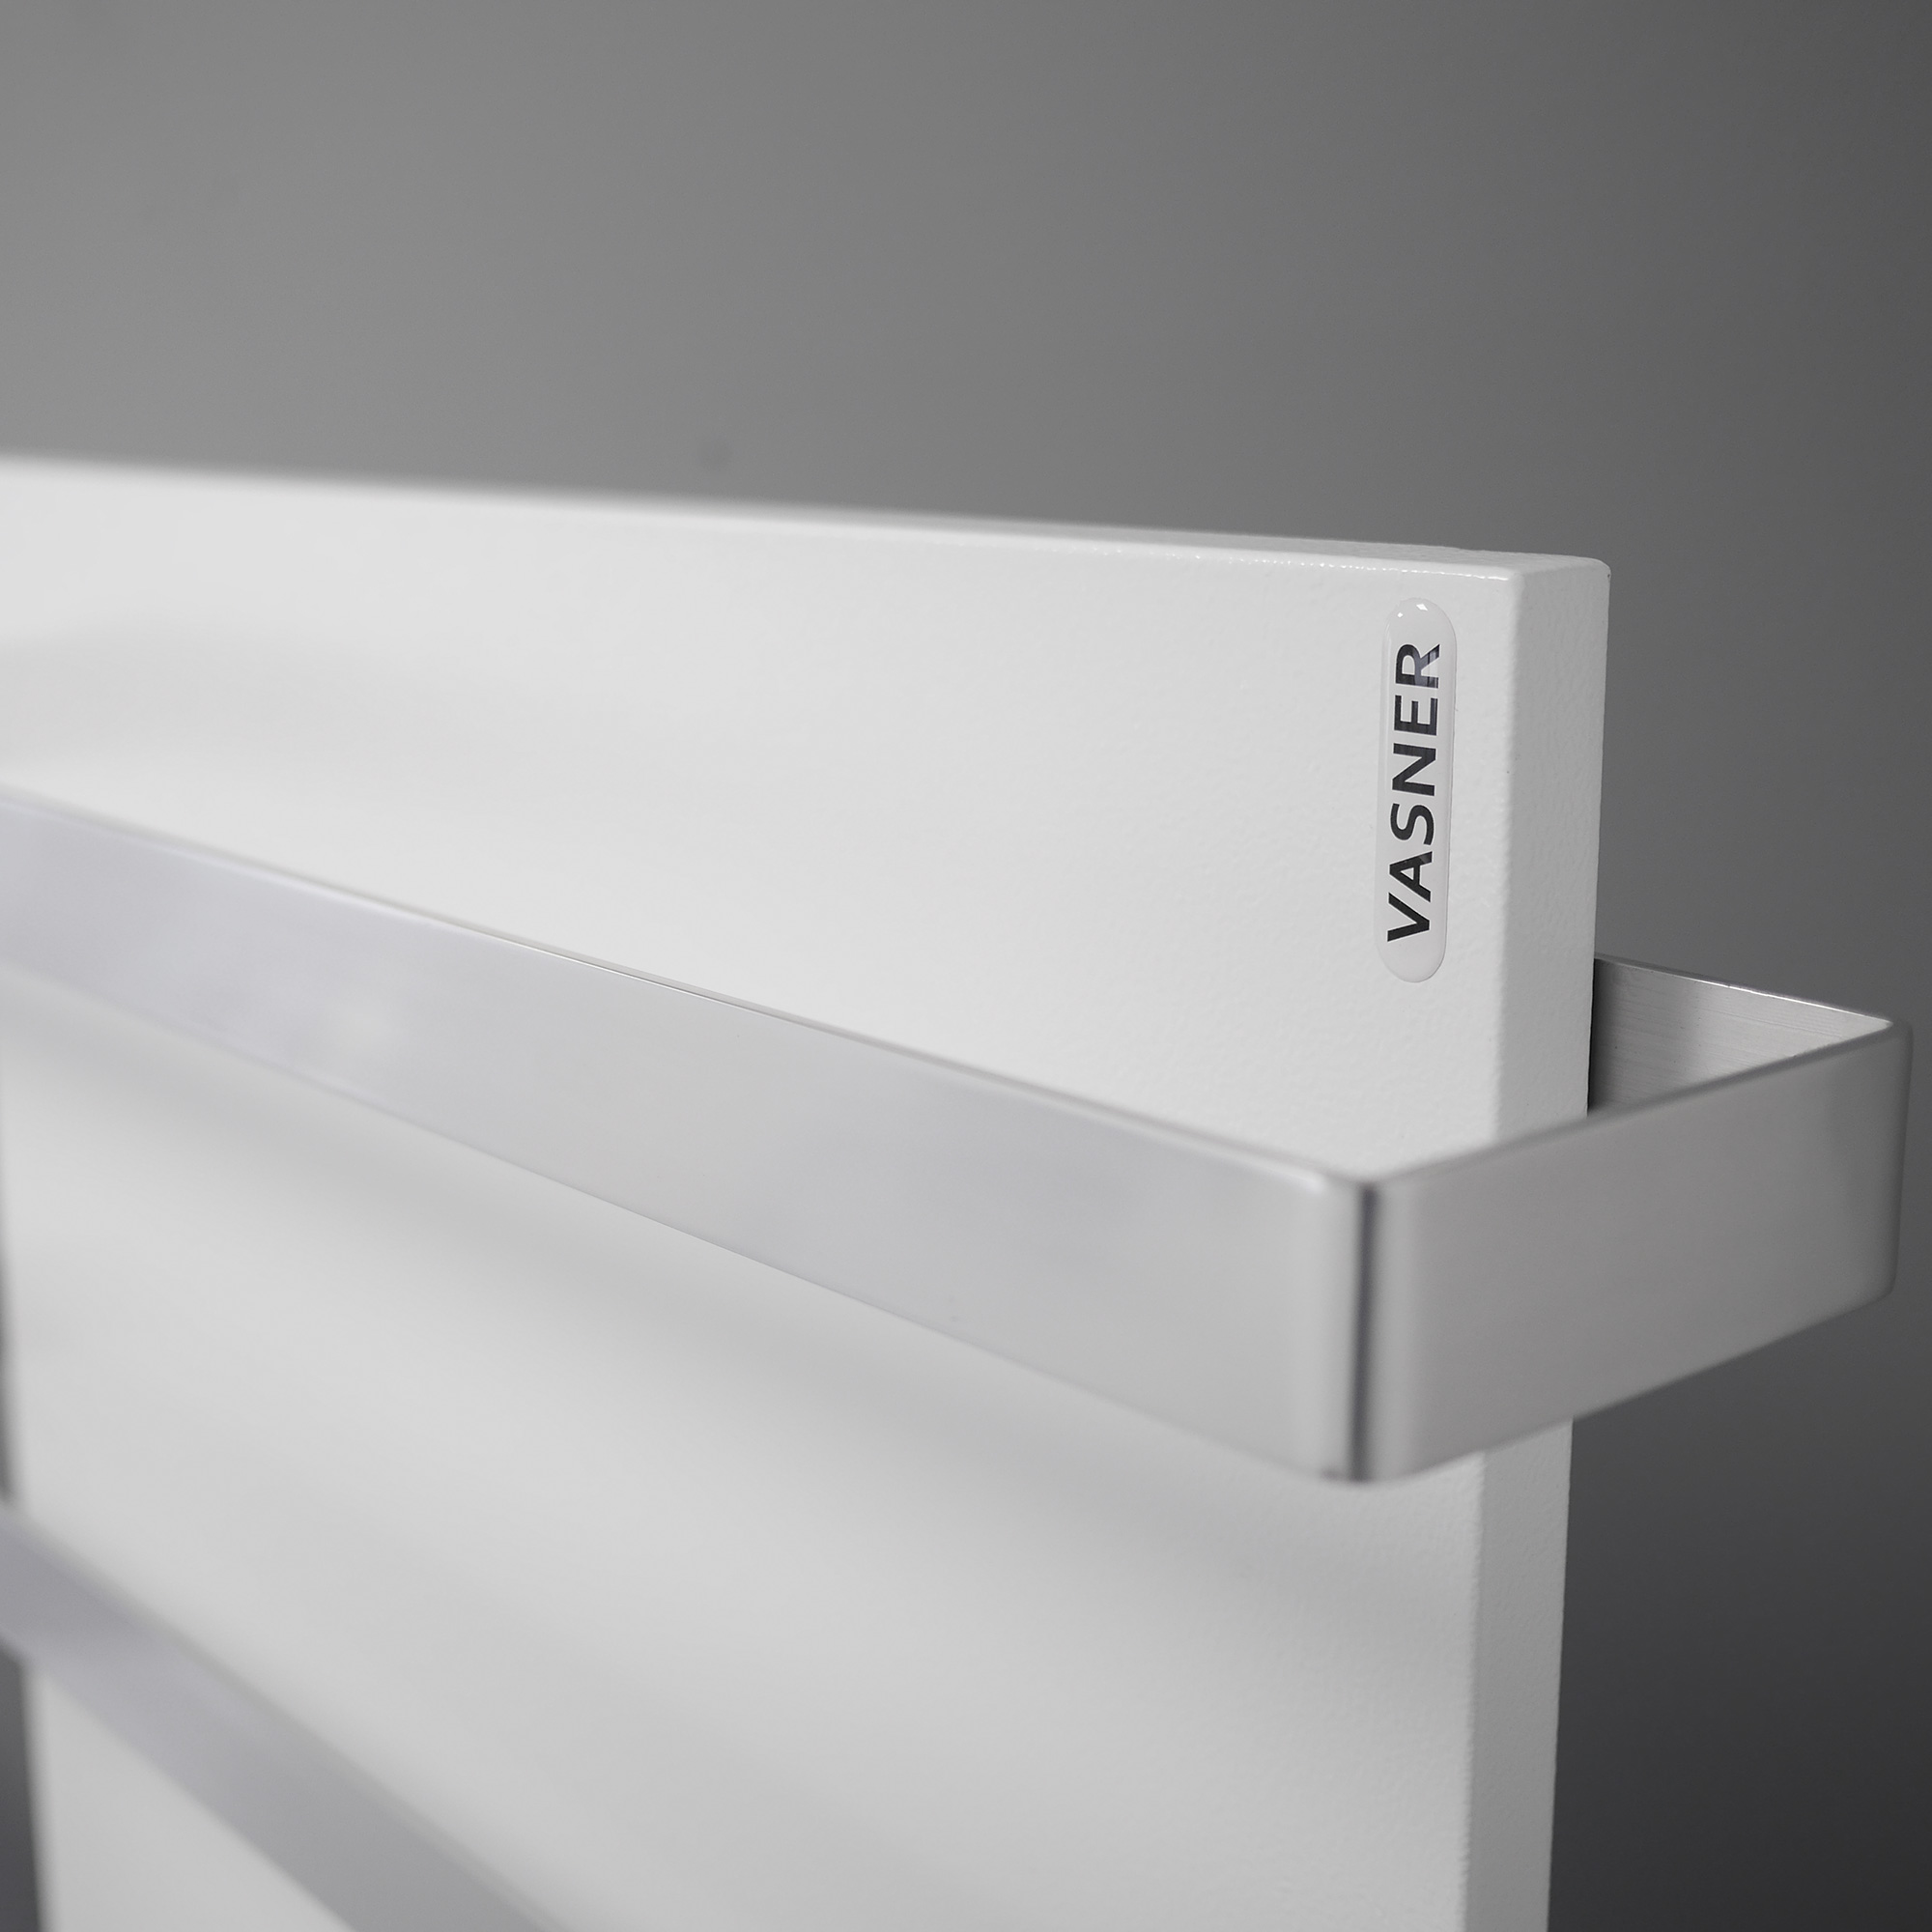 Towel-rails-as-Citara-panel-heater-accessories